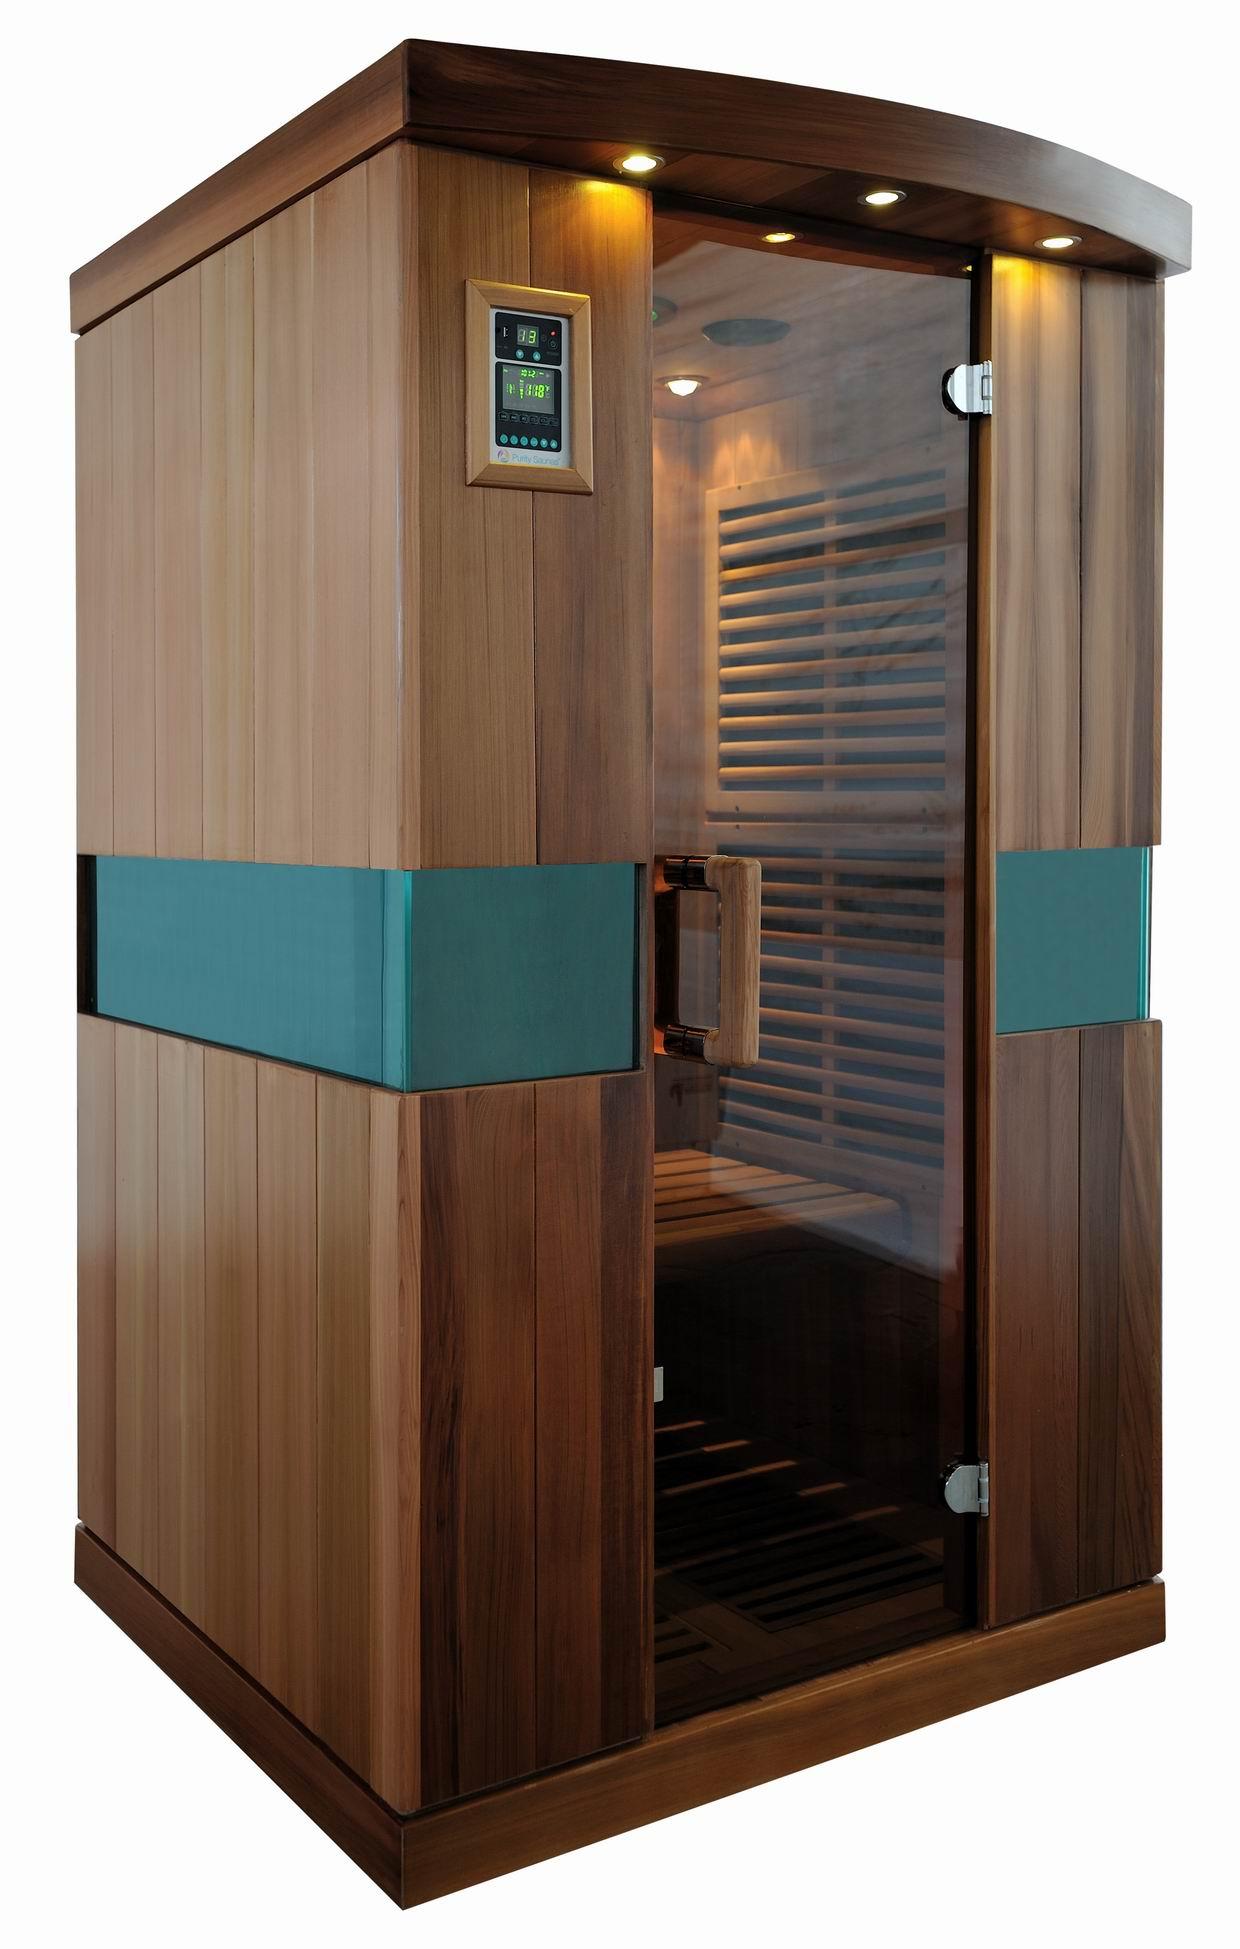 Infrared Sauna With Salt Wall In Nh Hotel Zandvoort The: New Zero Emf Carbon Nano Infrared Sauna Heater Far